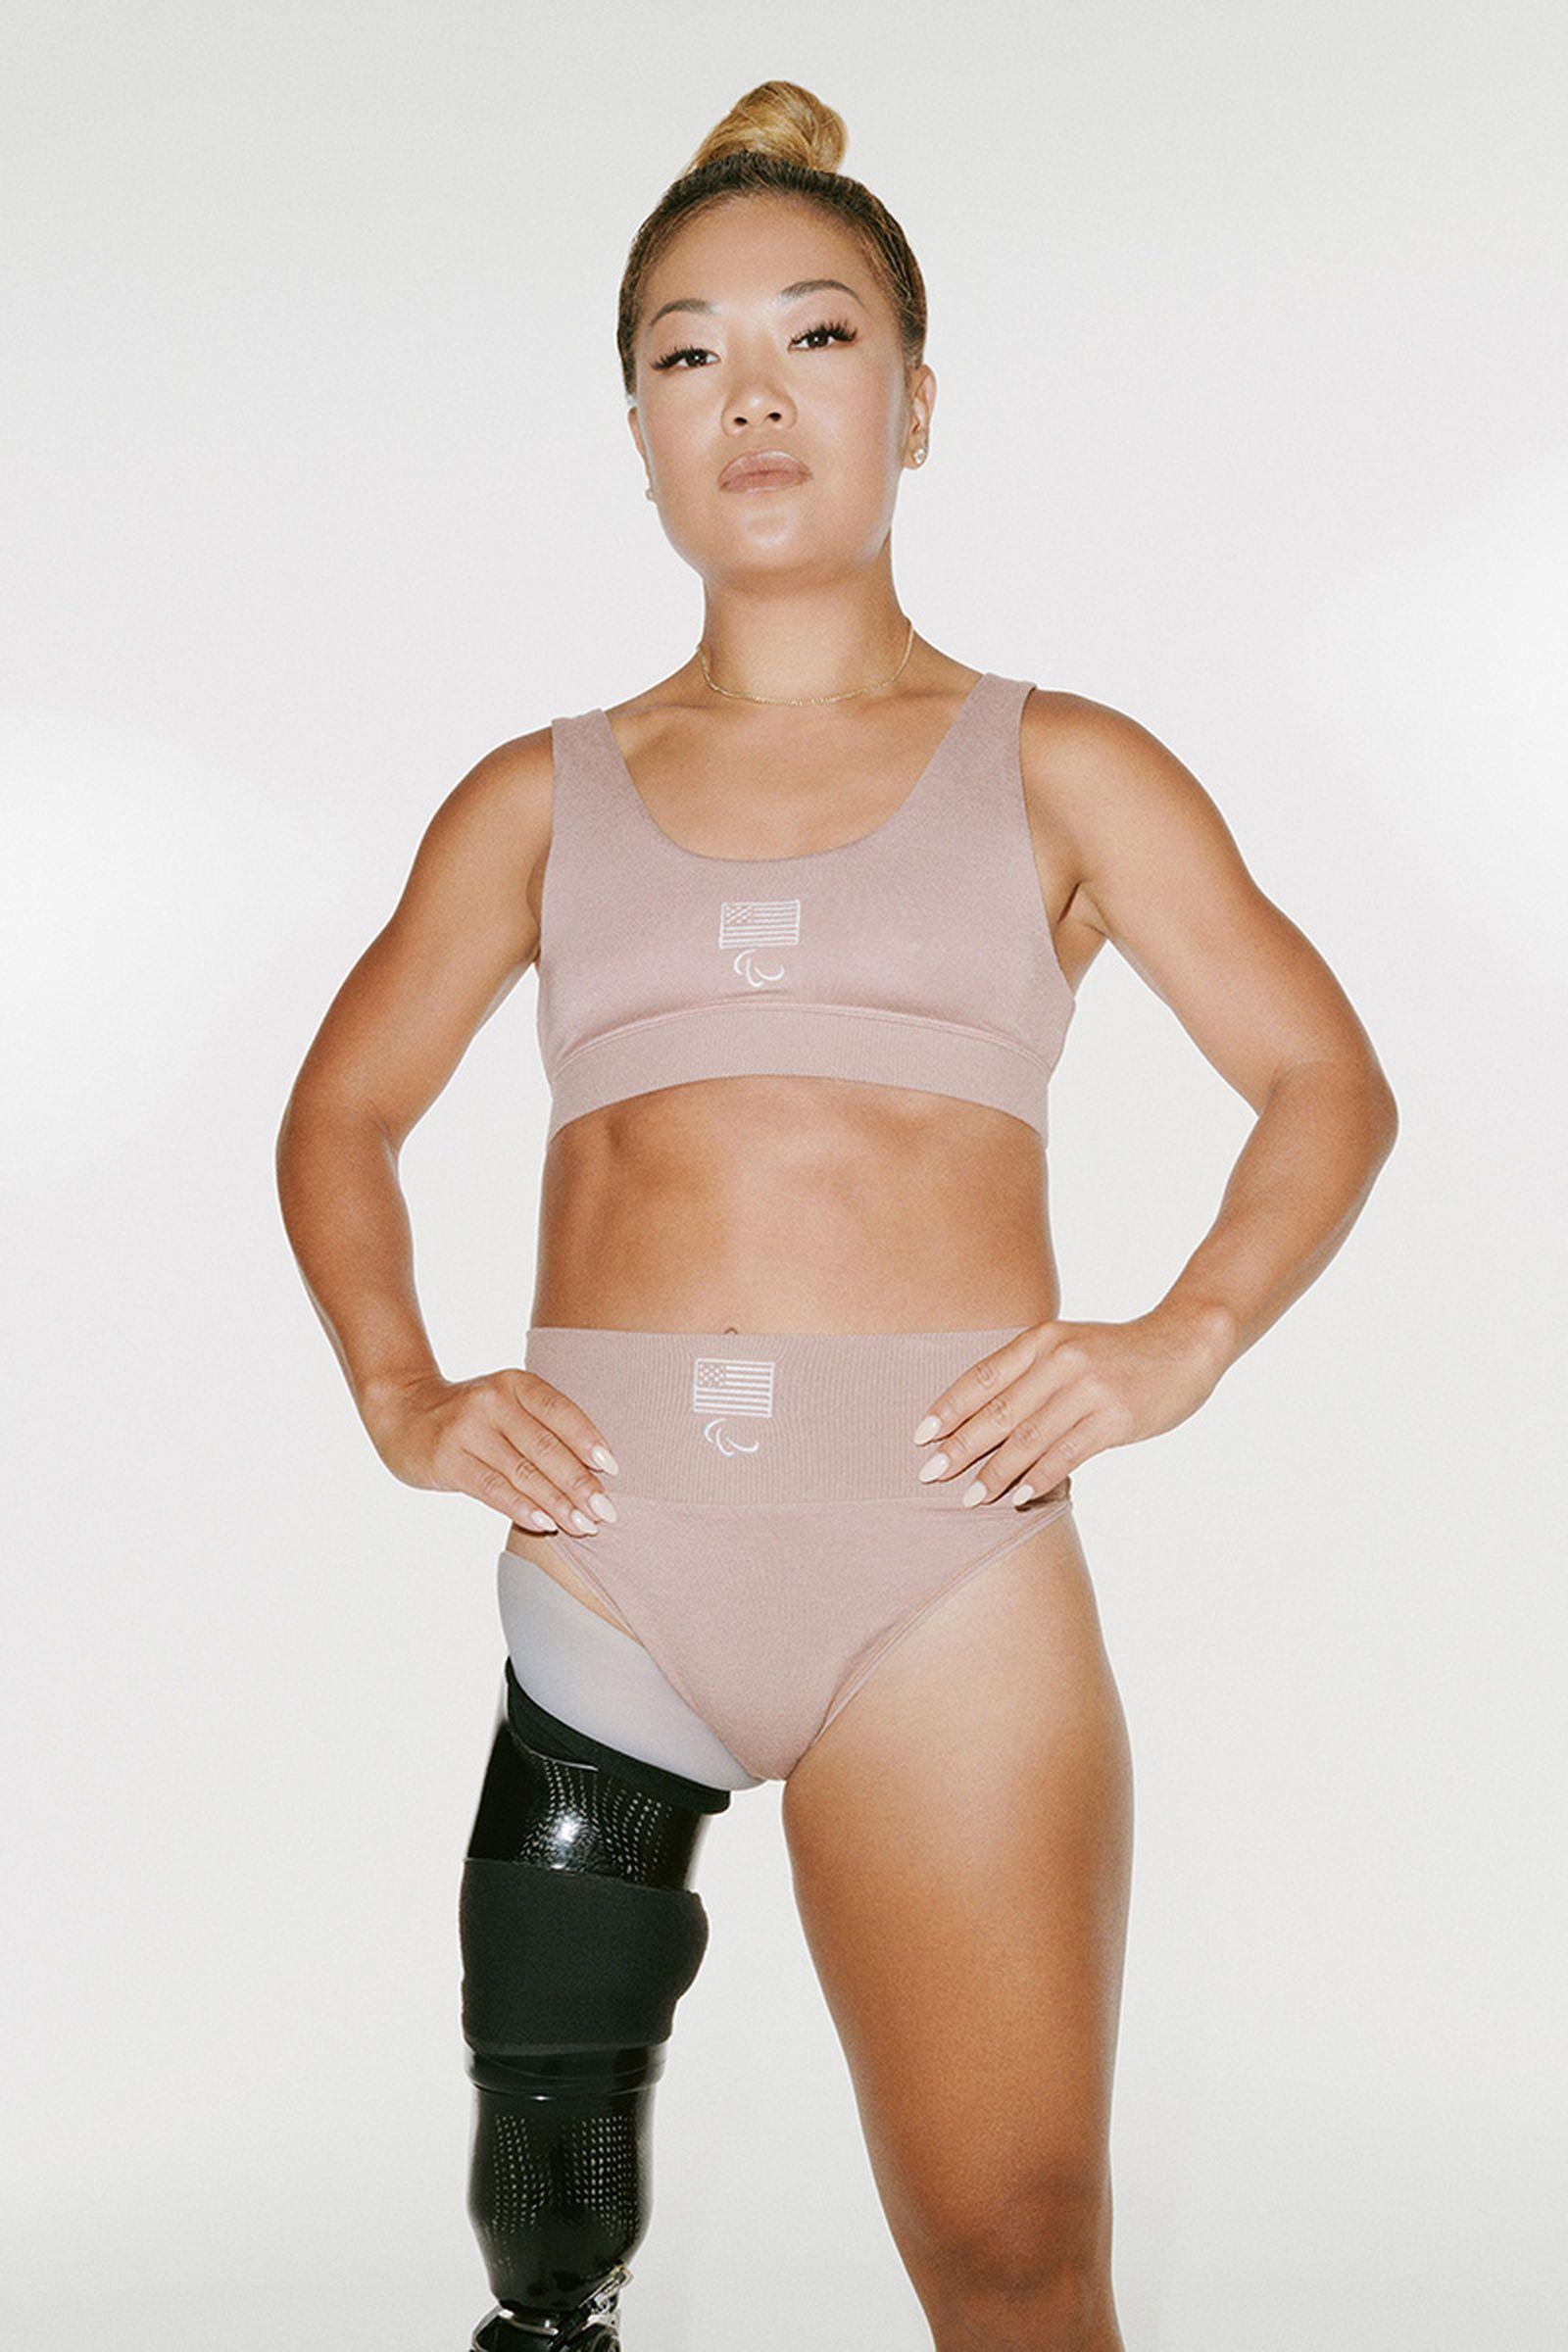 kim-kardashian-skims-tokyo-olympics-05